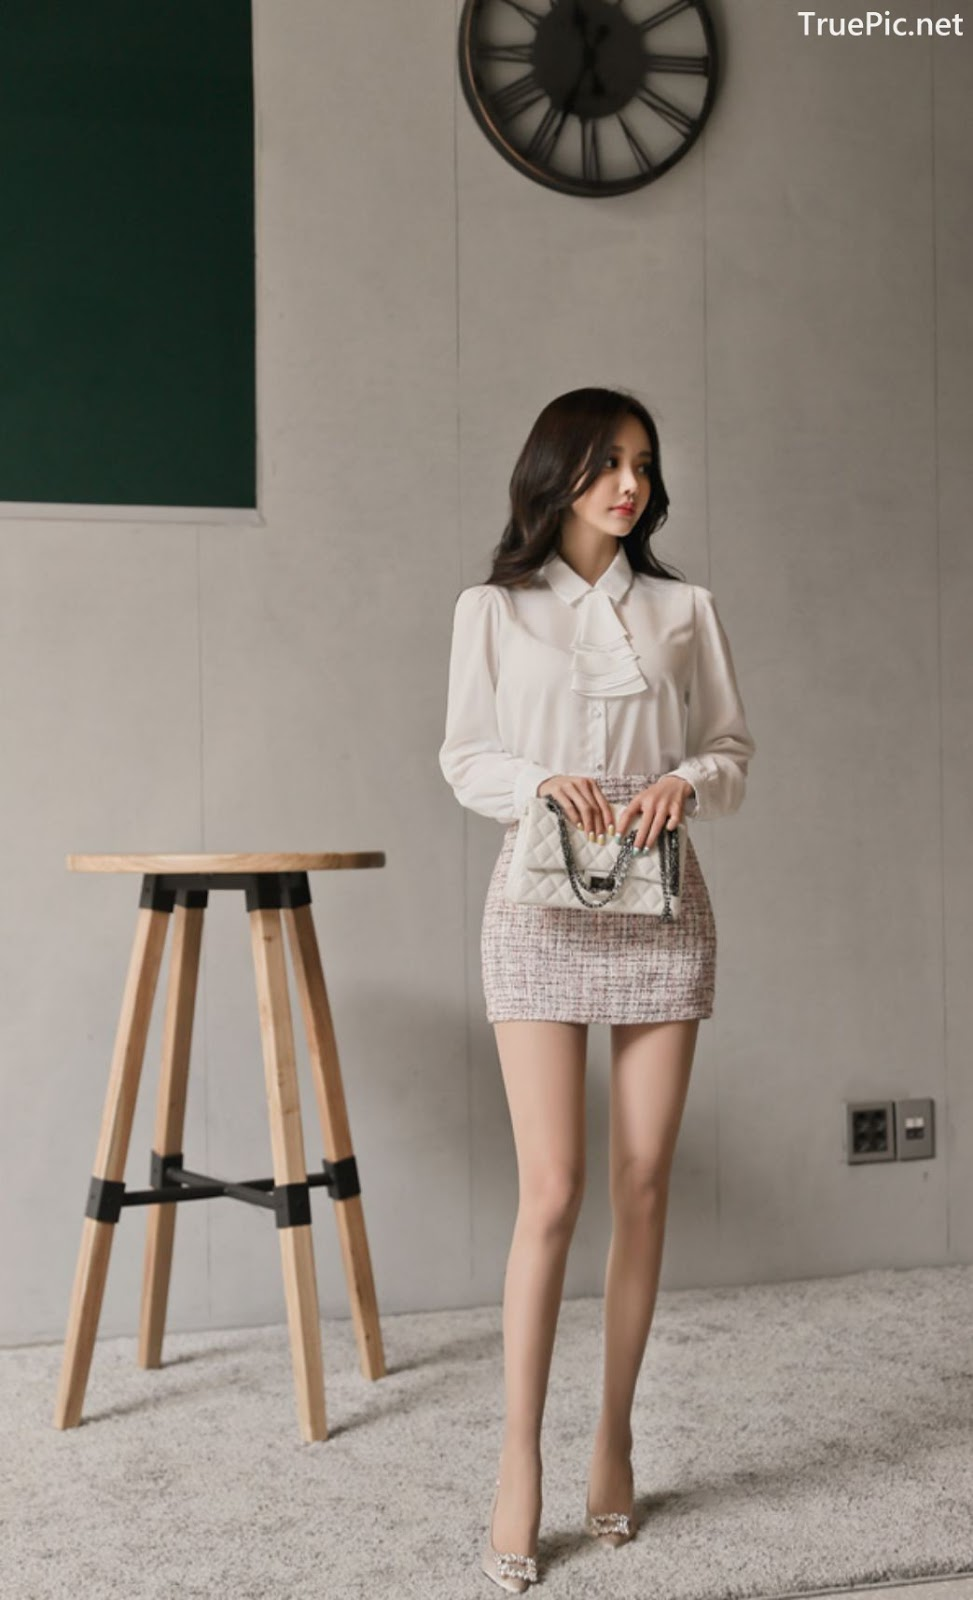 Image-Hot-Korean-Fashion-Model-Son-Yoon-Joo-She-So-Lovely-With-Miniskirt-TruePic.net- Picture-9